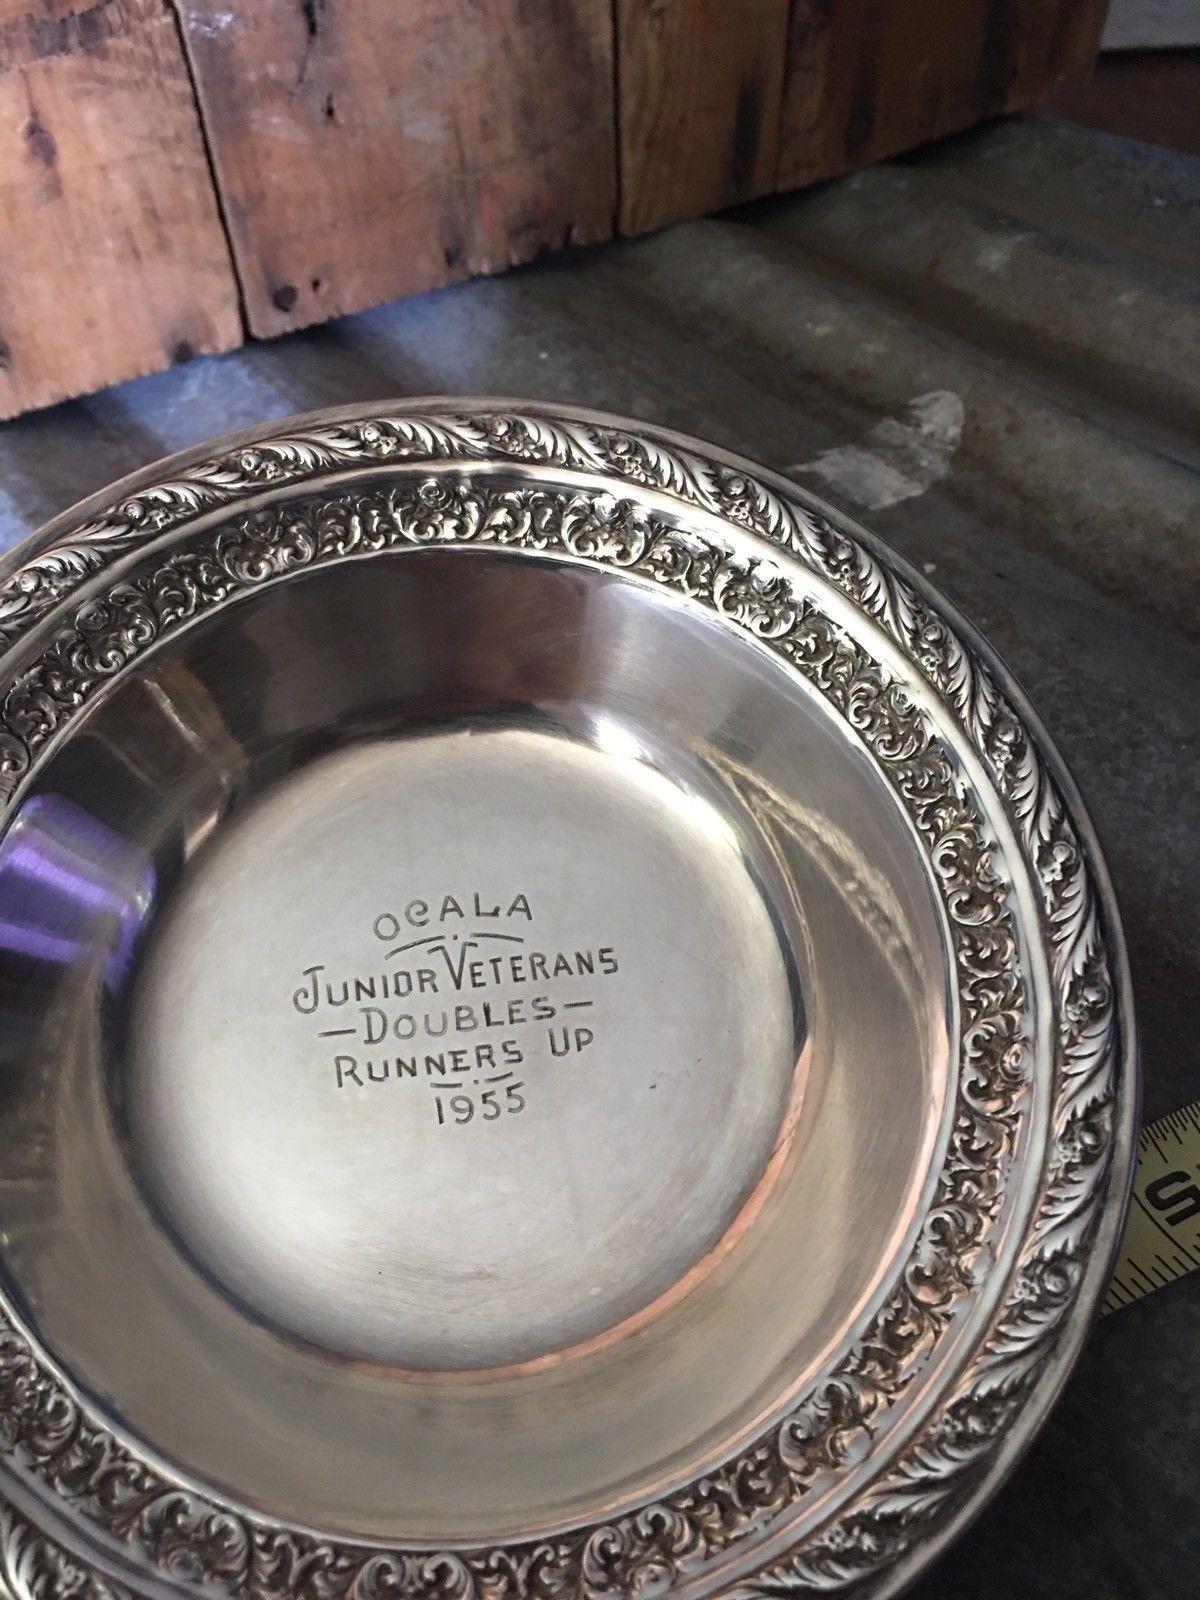 Vintage Sp Ocala Fl Tennis Trophy 1955 Doubles Ornate Bowl Farmhouse Decor Ebay Farmhouse Decor Tennis Trophy Vintage